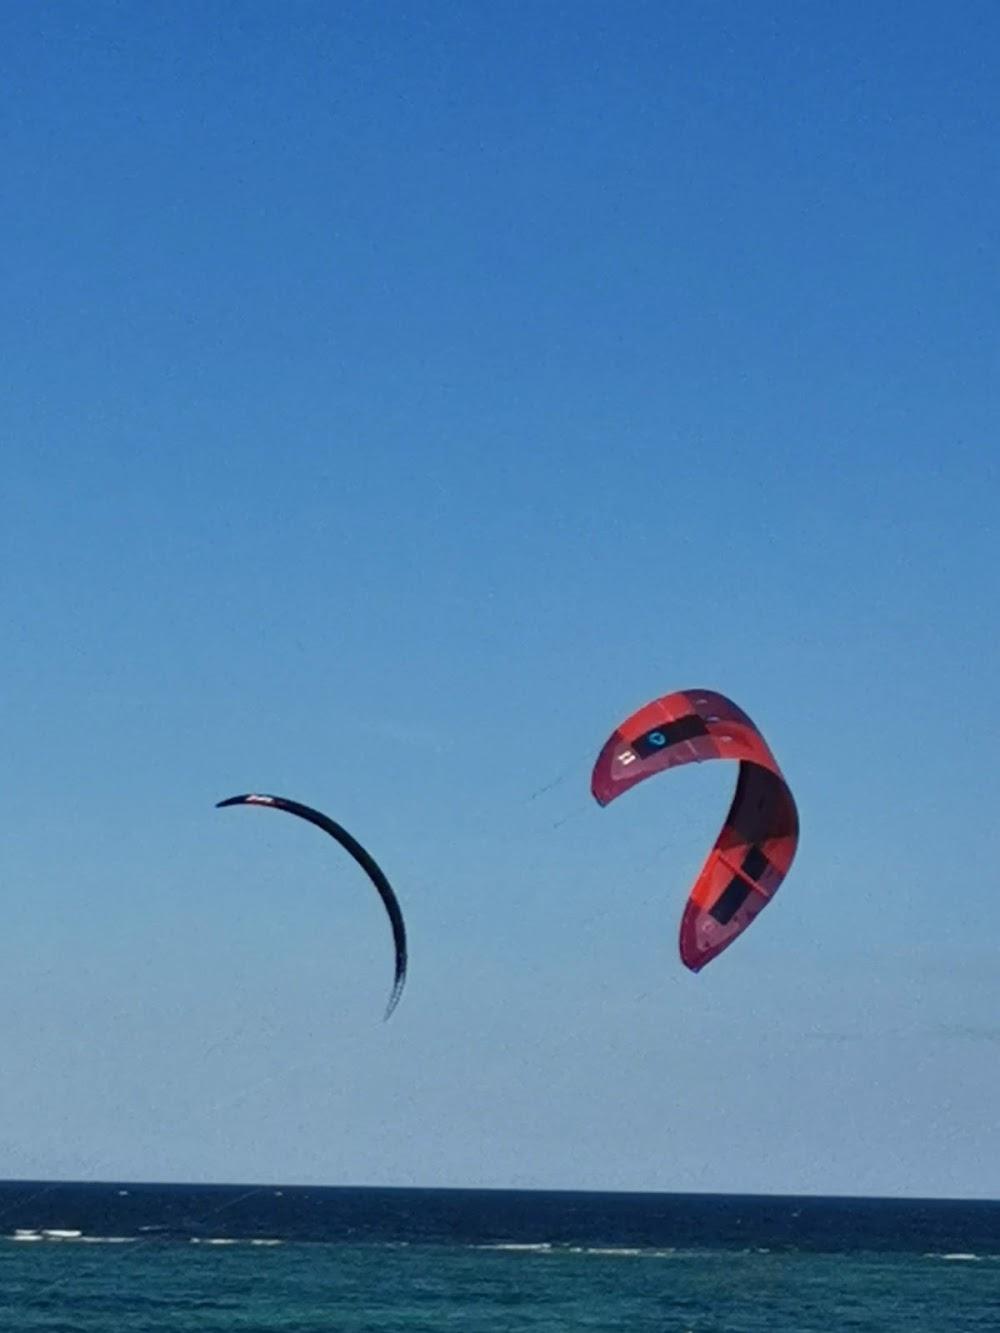 El Nido Kite & windsurf center